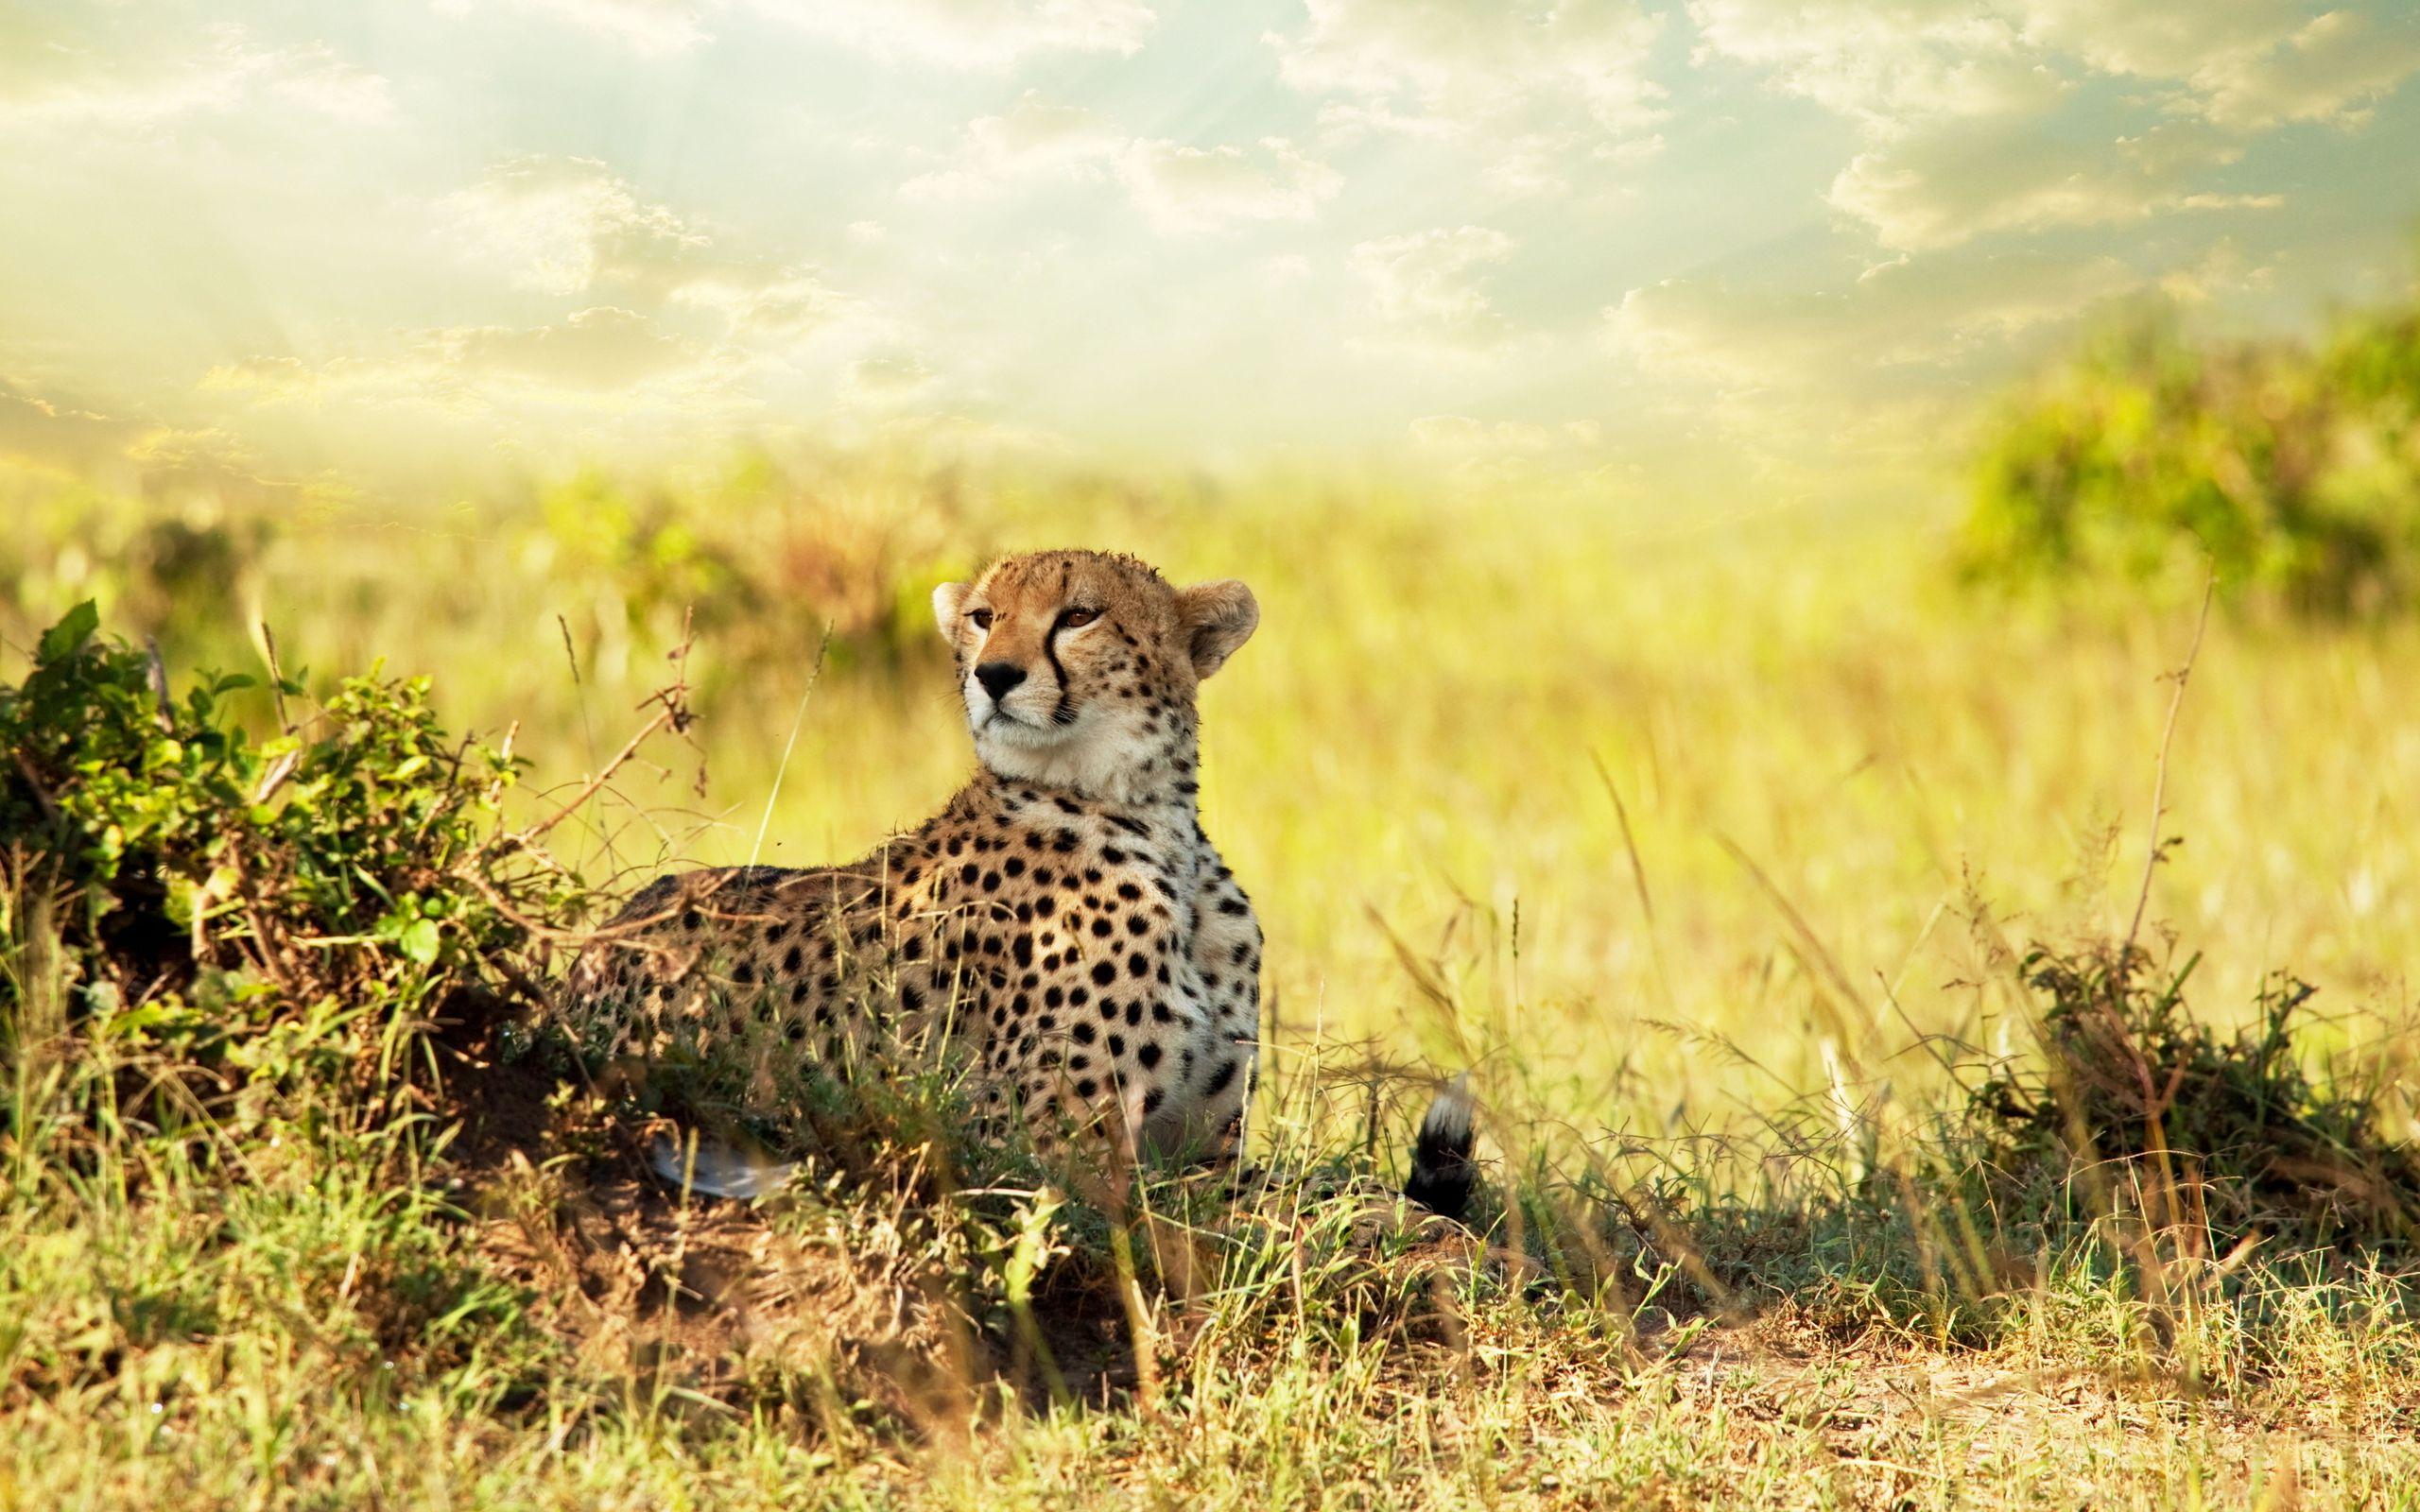 Cheetah Savanna Africa Wallpapers   HD Wallpapers